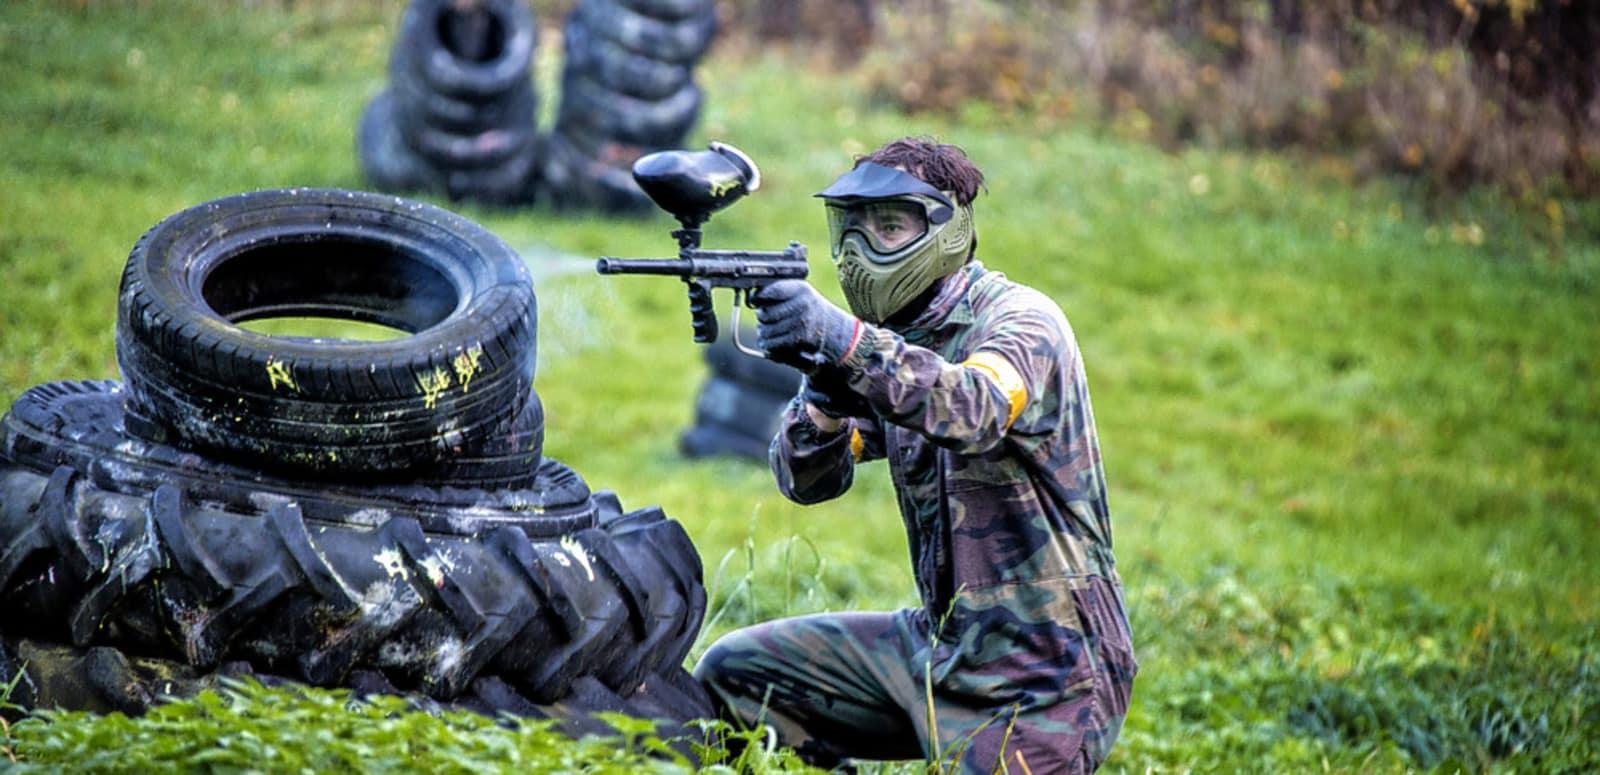 World of tanks matchmaking beeinflussen